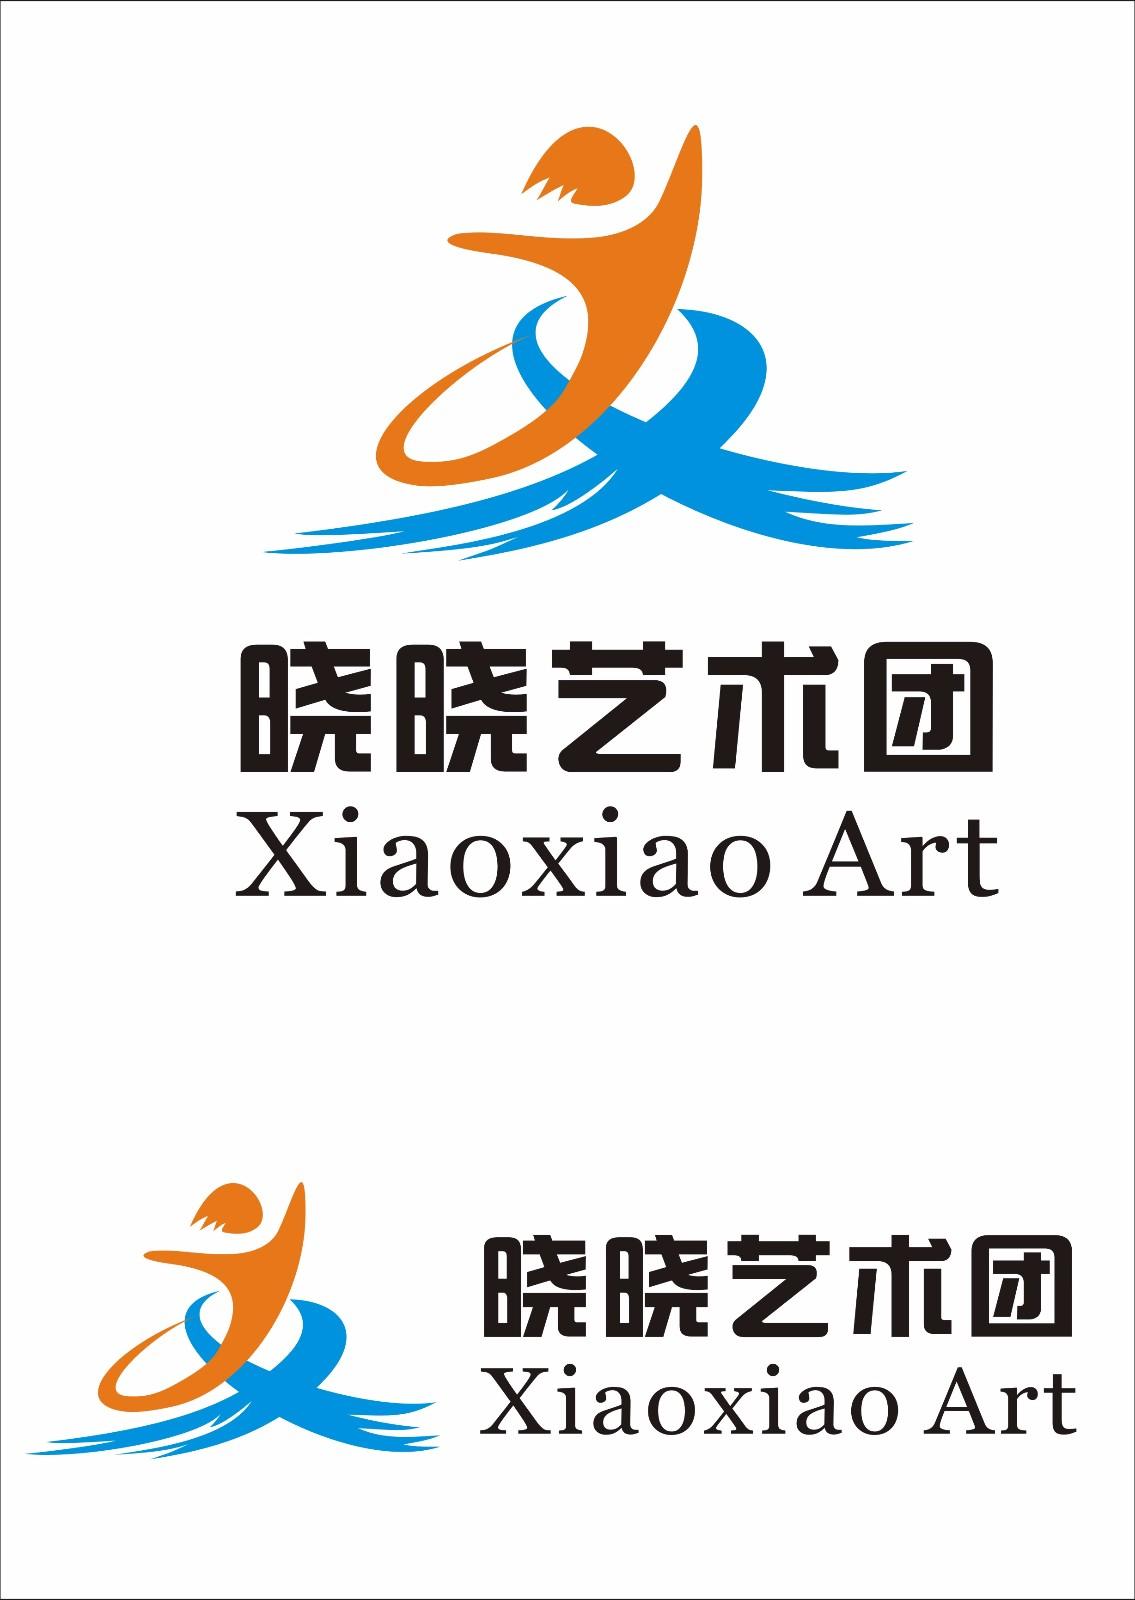 少儿艺术团 logo设计 -logo设计